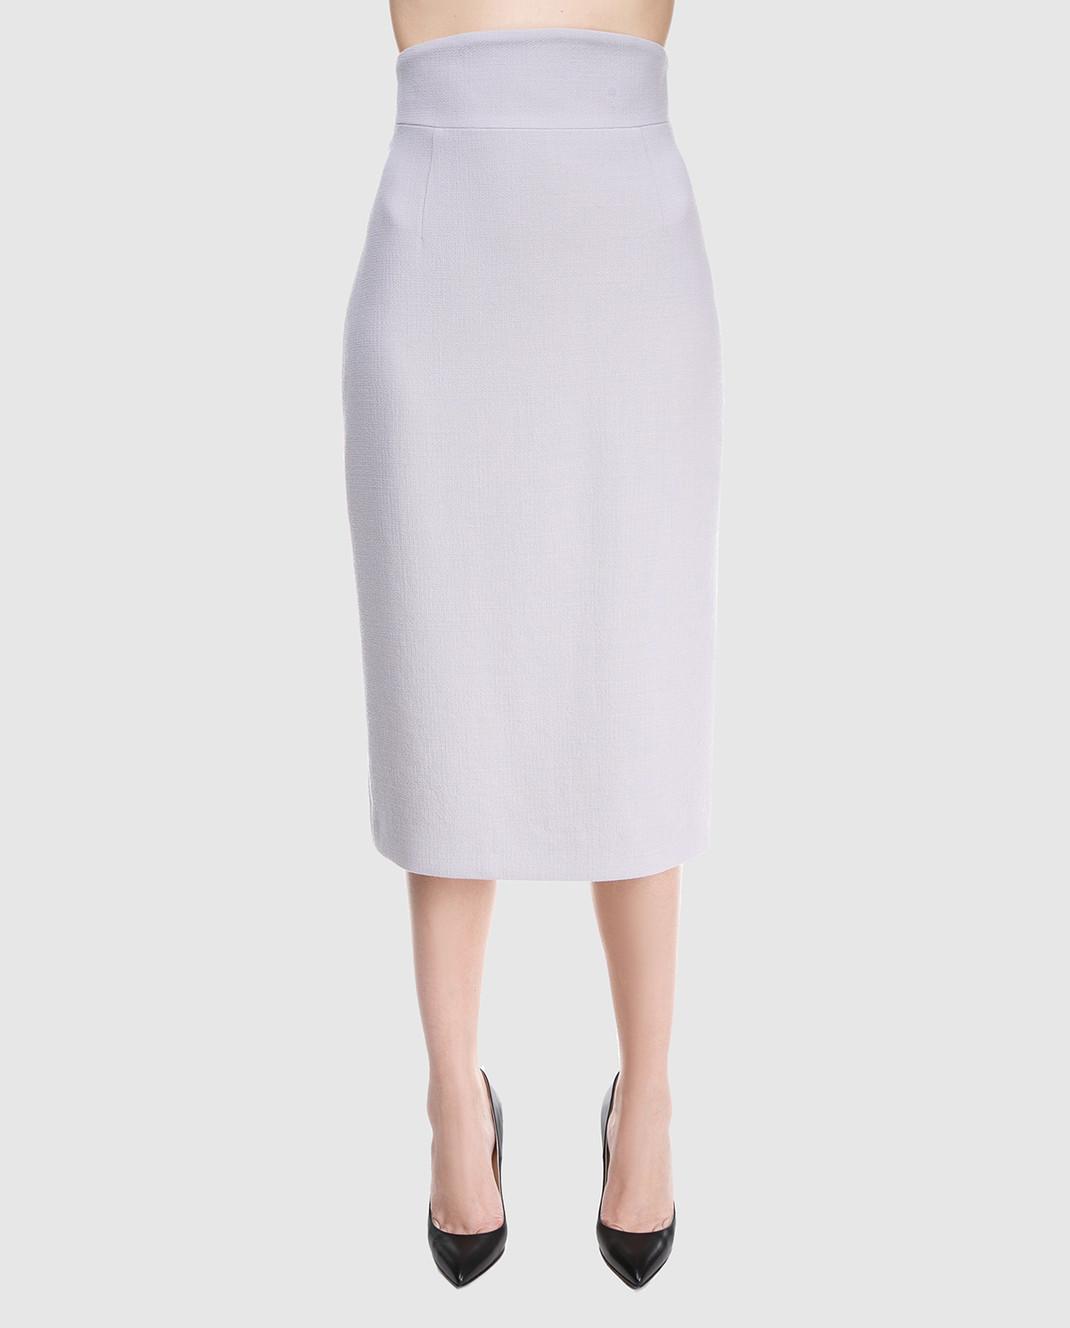 A la Russe Светло-серая юбка 371004 изображение 3